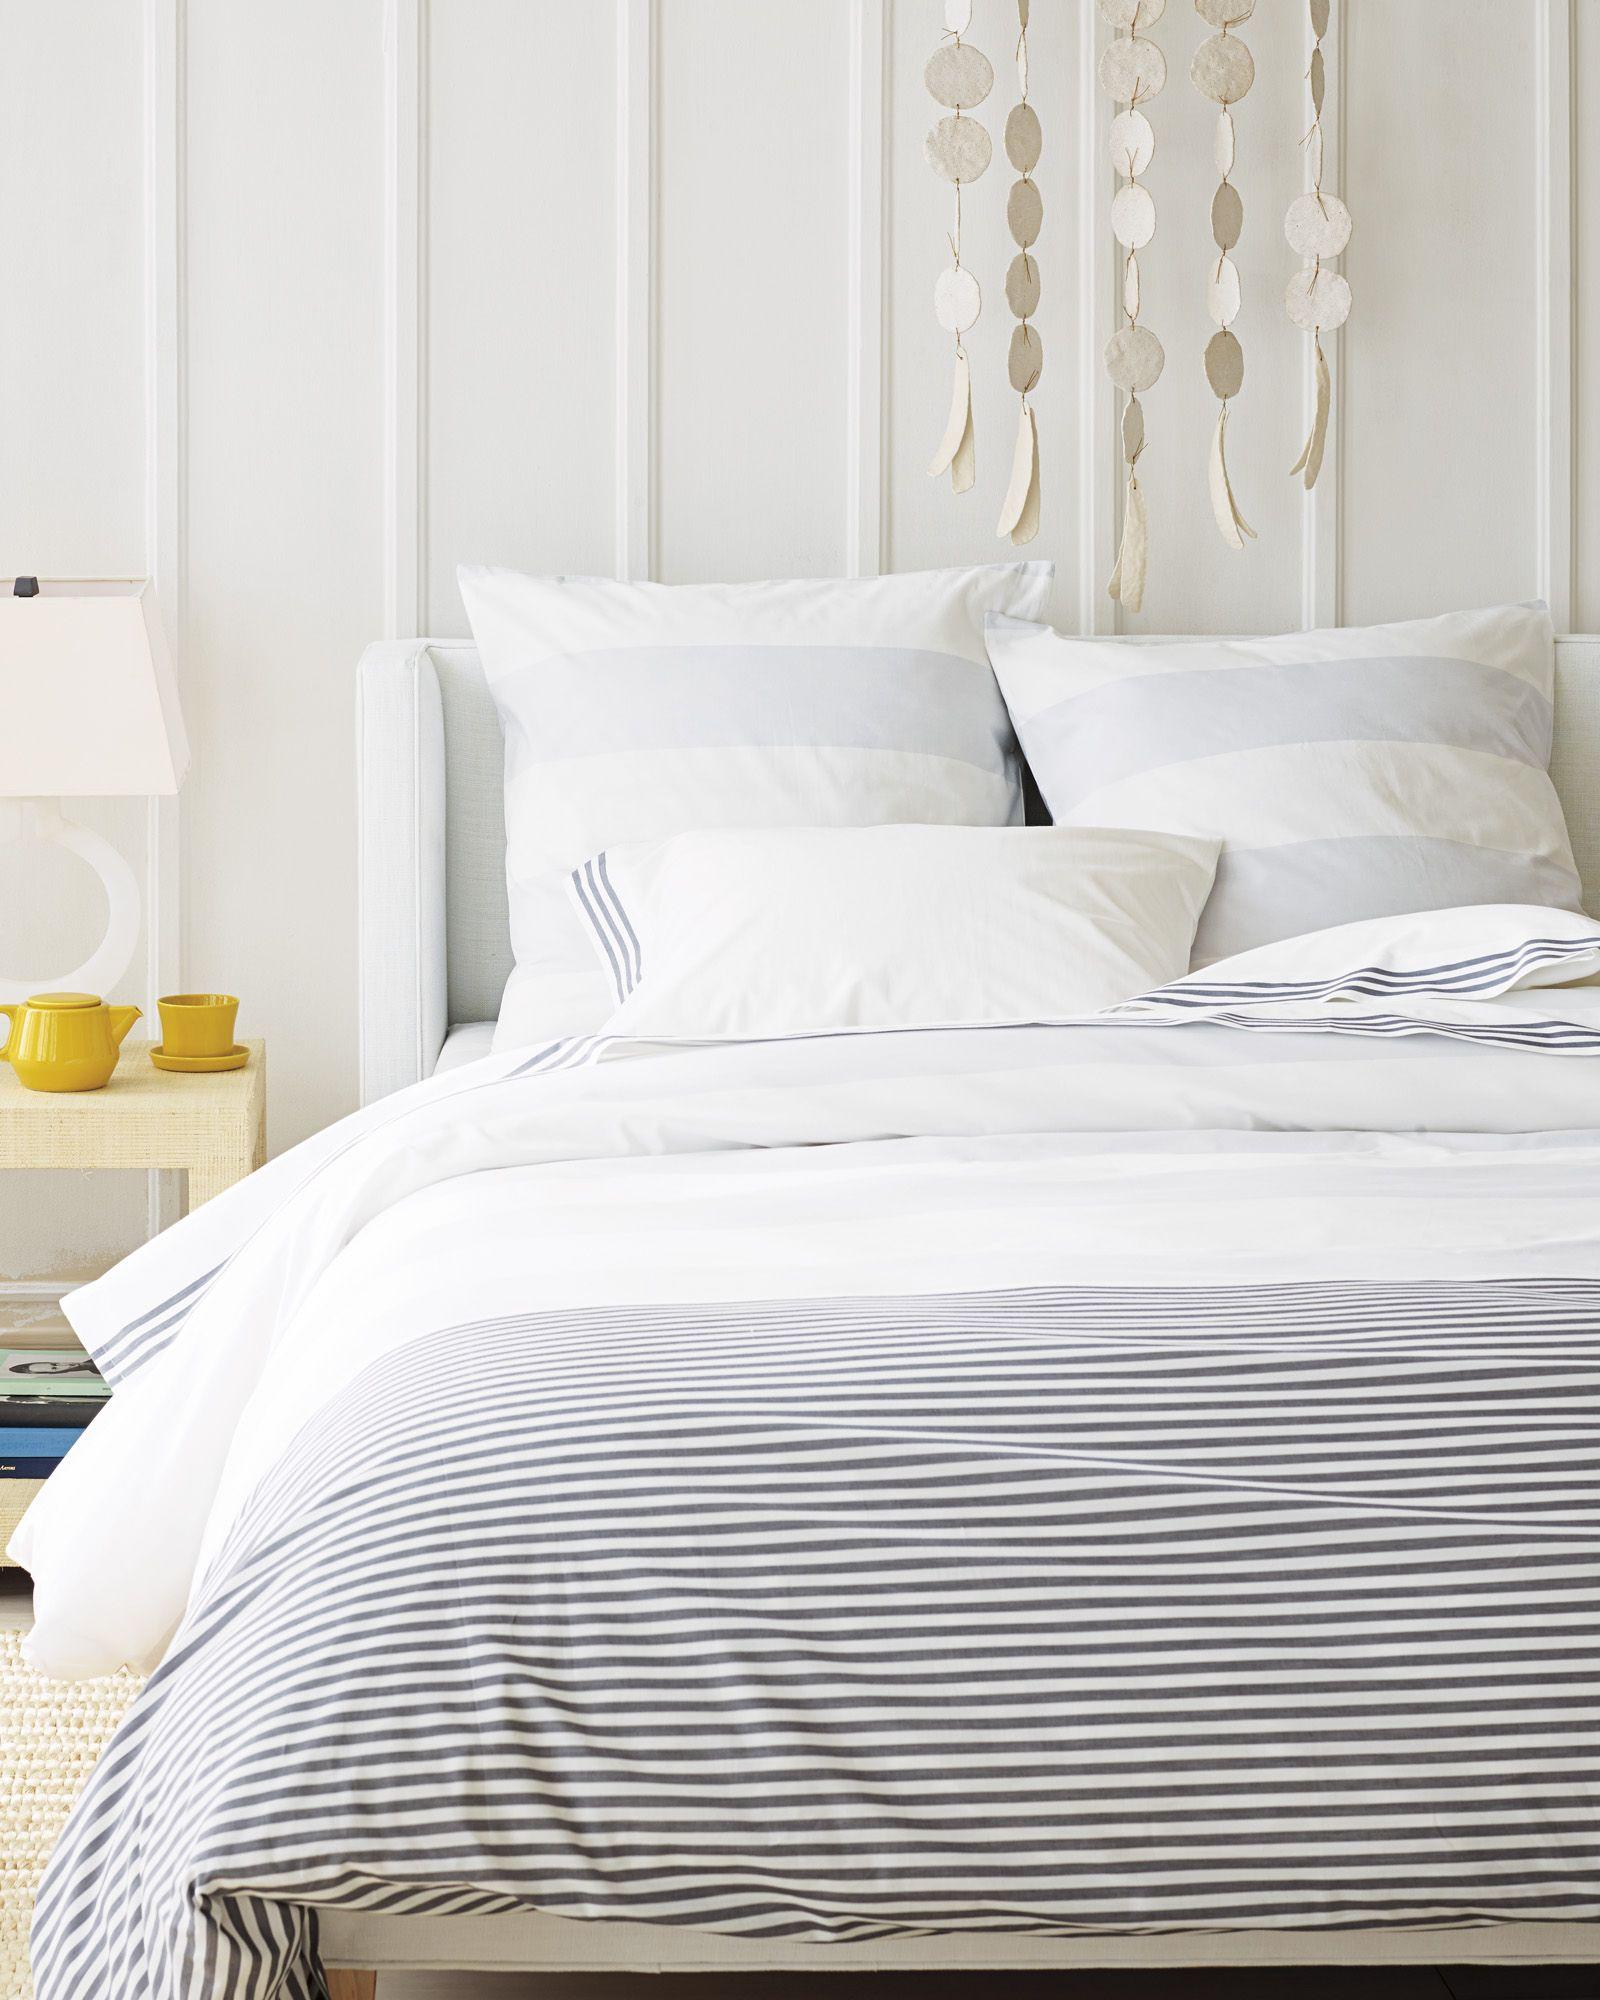 regatta pinterest bedding for navy bed striped duvet pin home sailor the